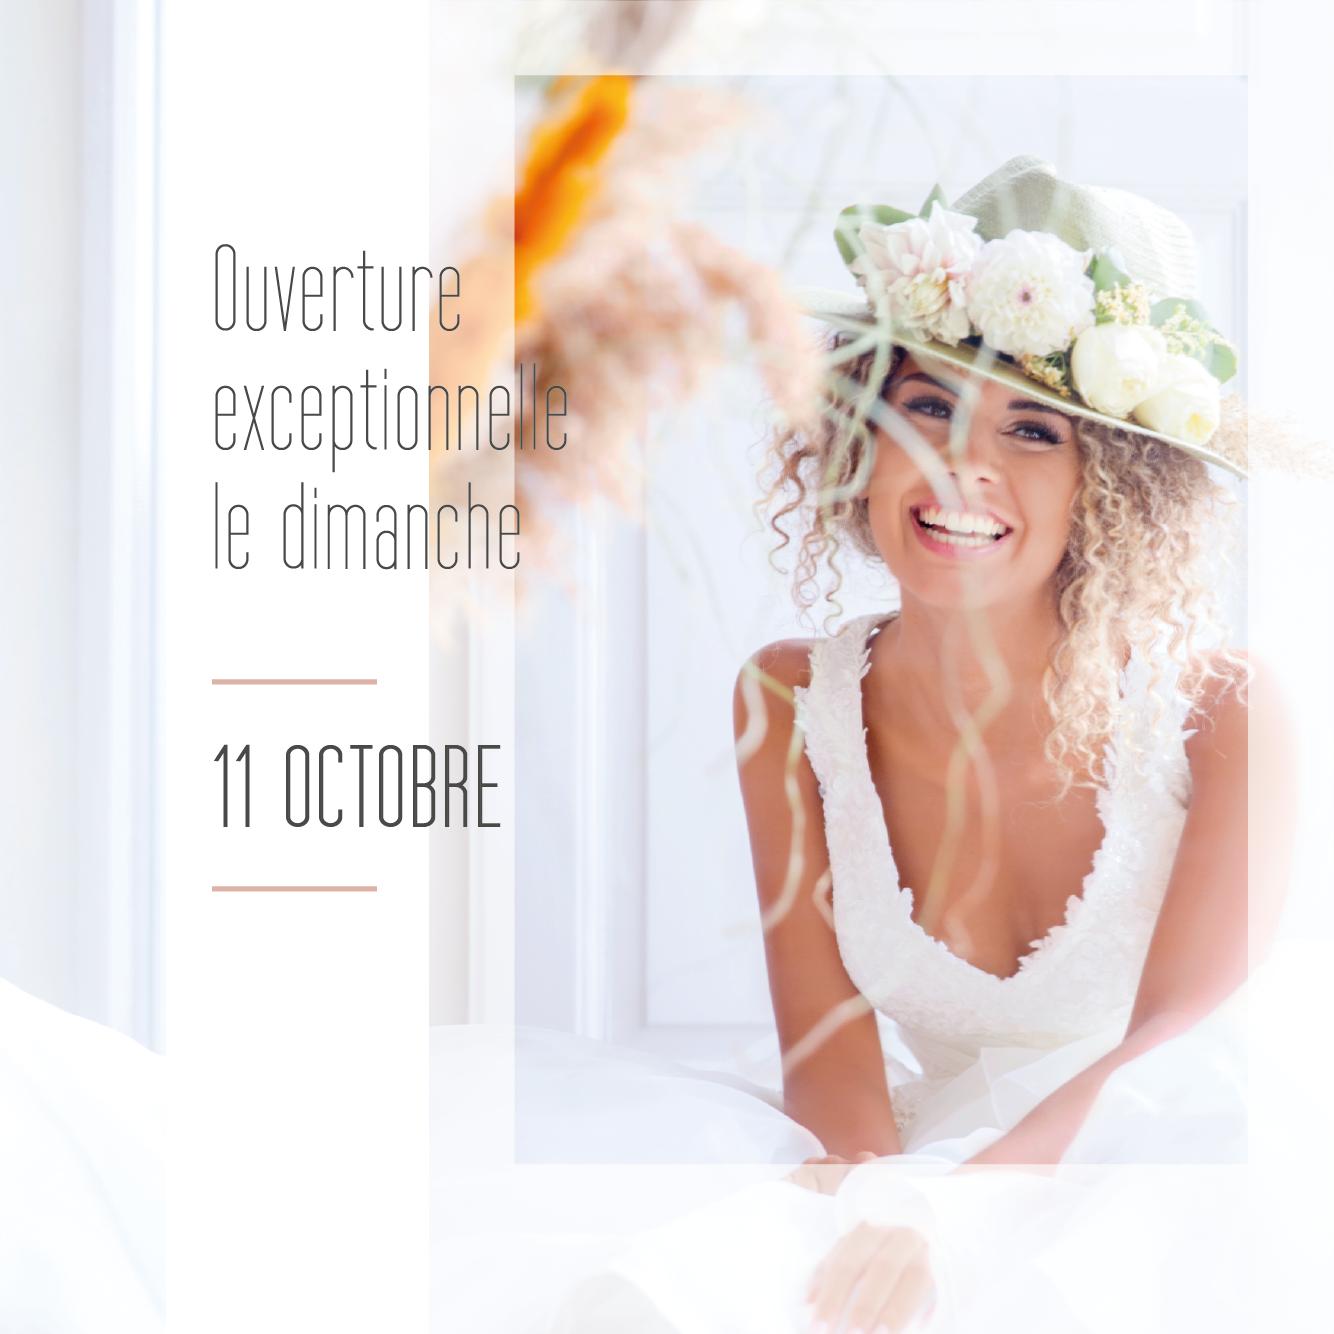 DMO_OuvetureDimanche_Octobre_PostFB